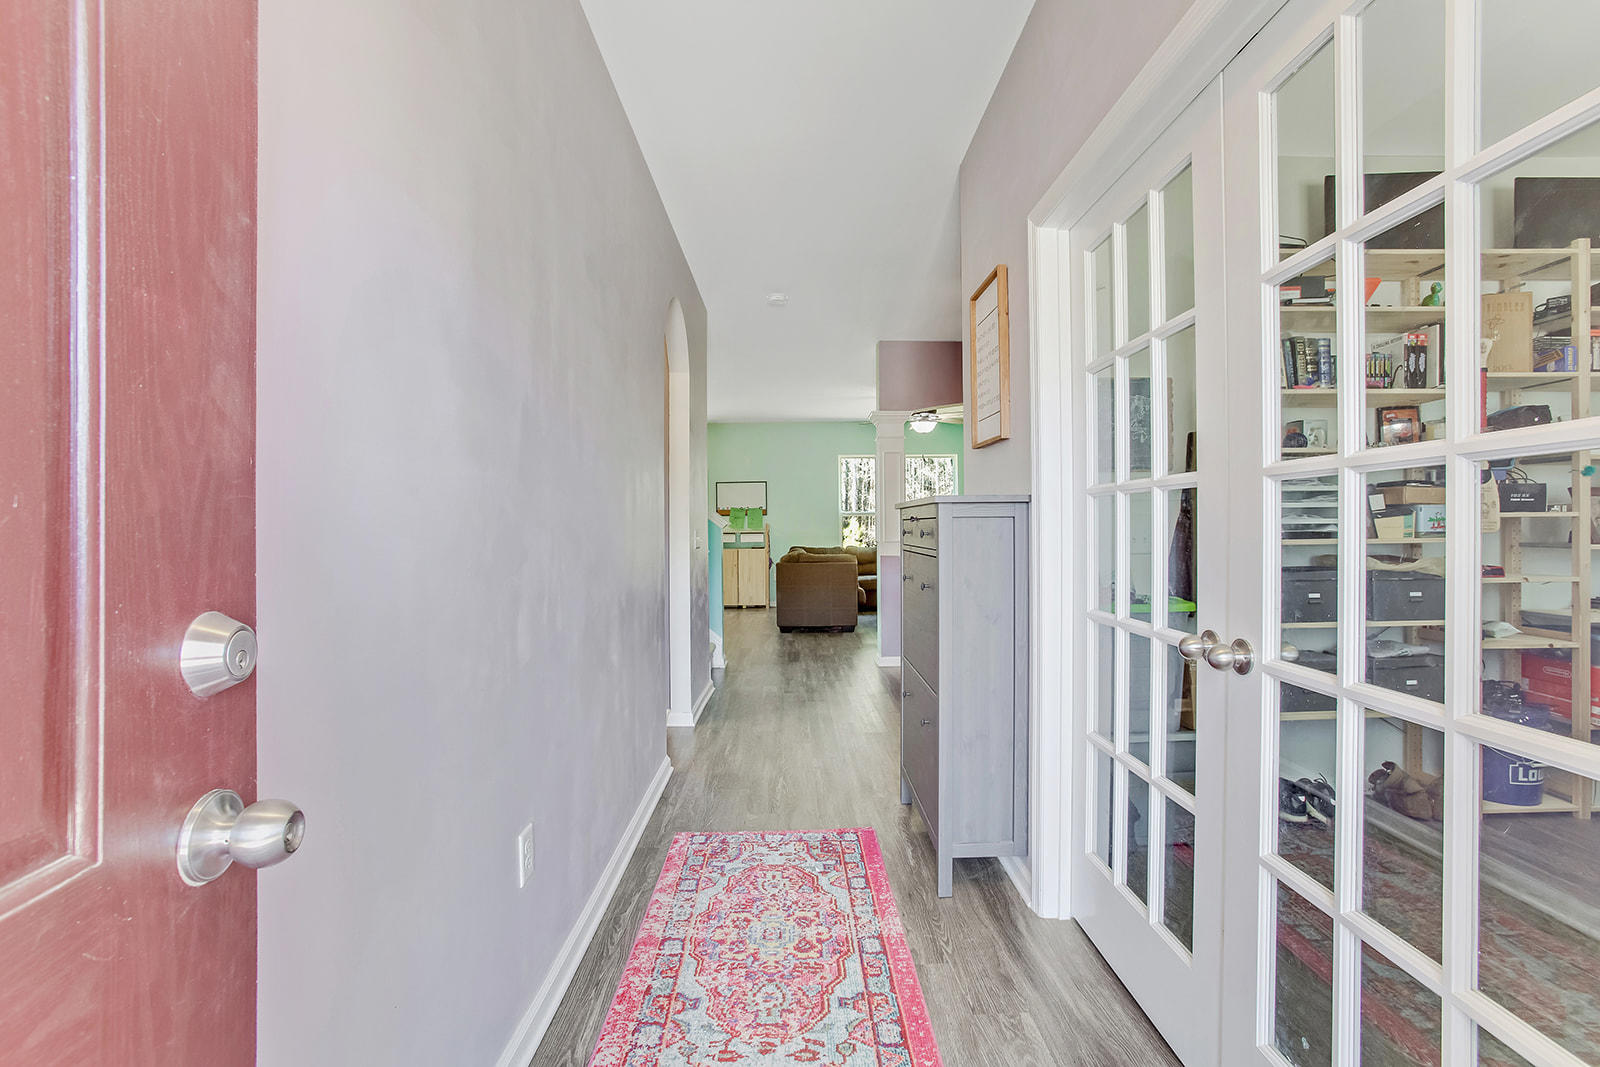 Cypress Grove Homes For Sale - 243 Weeping Cypress, Moncks Corner, SC - 1